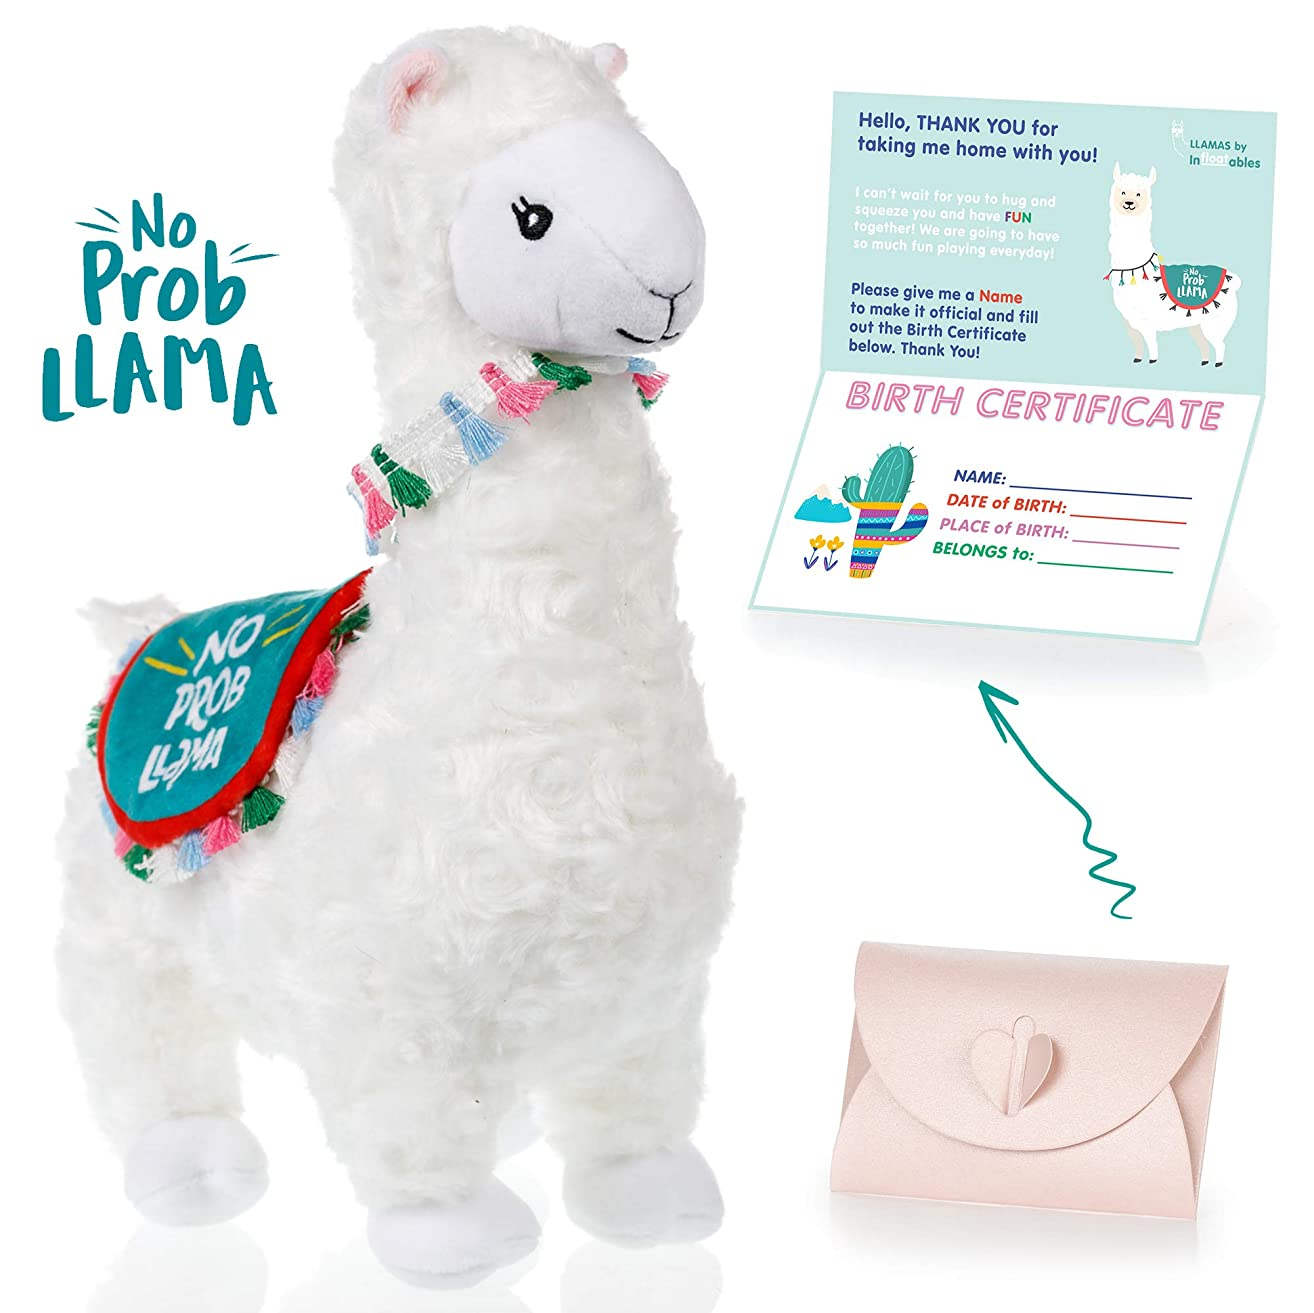 llama stuffed animal - The Original No Prob Llama lama alpaca plush animals toy. Perfect Llama gifts for Baby Showers, Birthdays, Graduation or Christmas. Cute, Fun, Super Soft, and Pre Gift Wrapped!